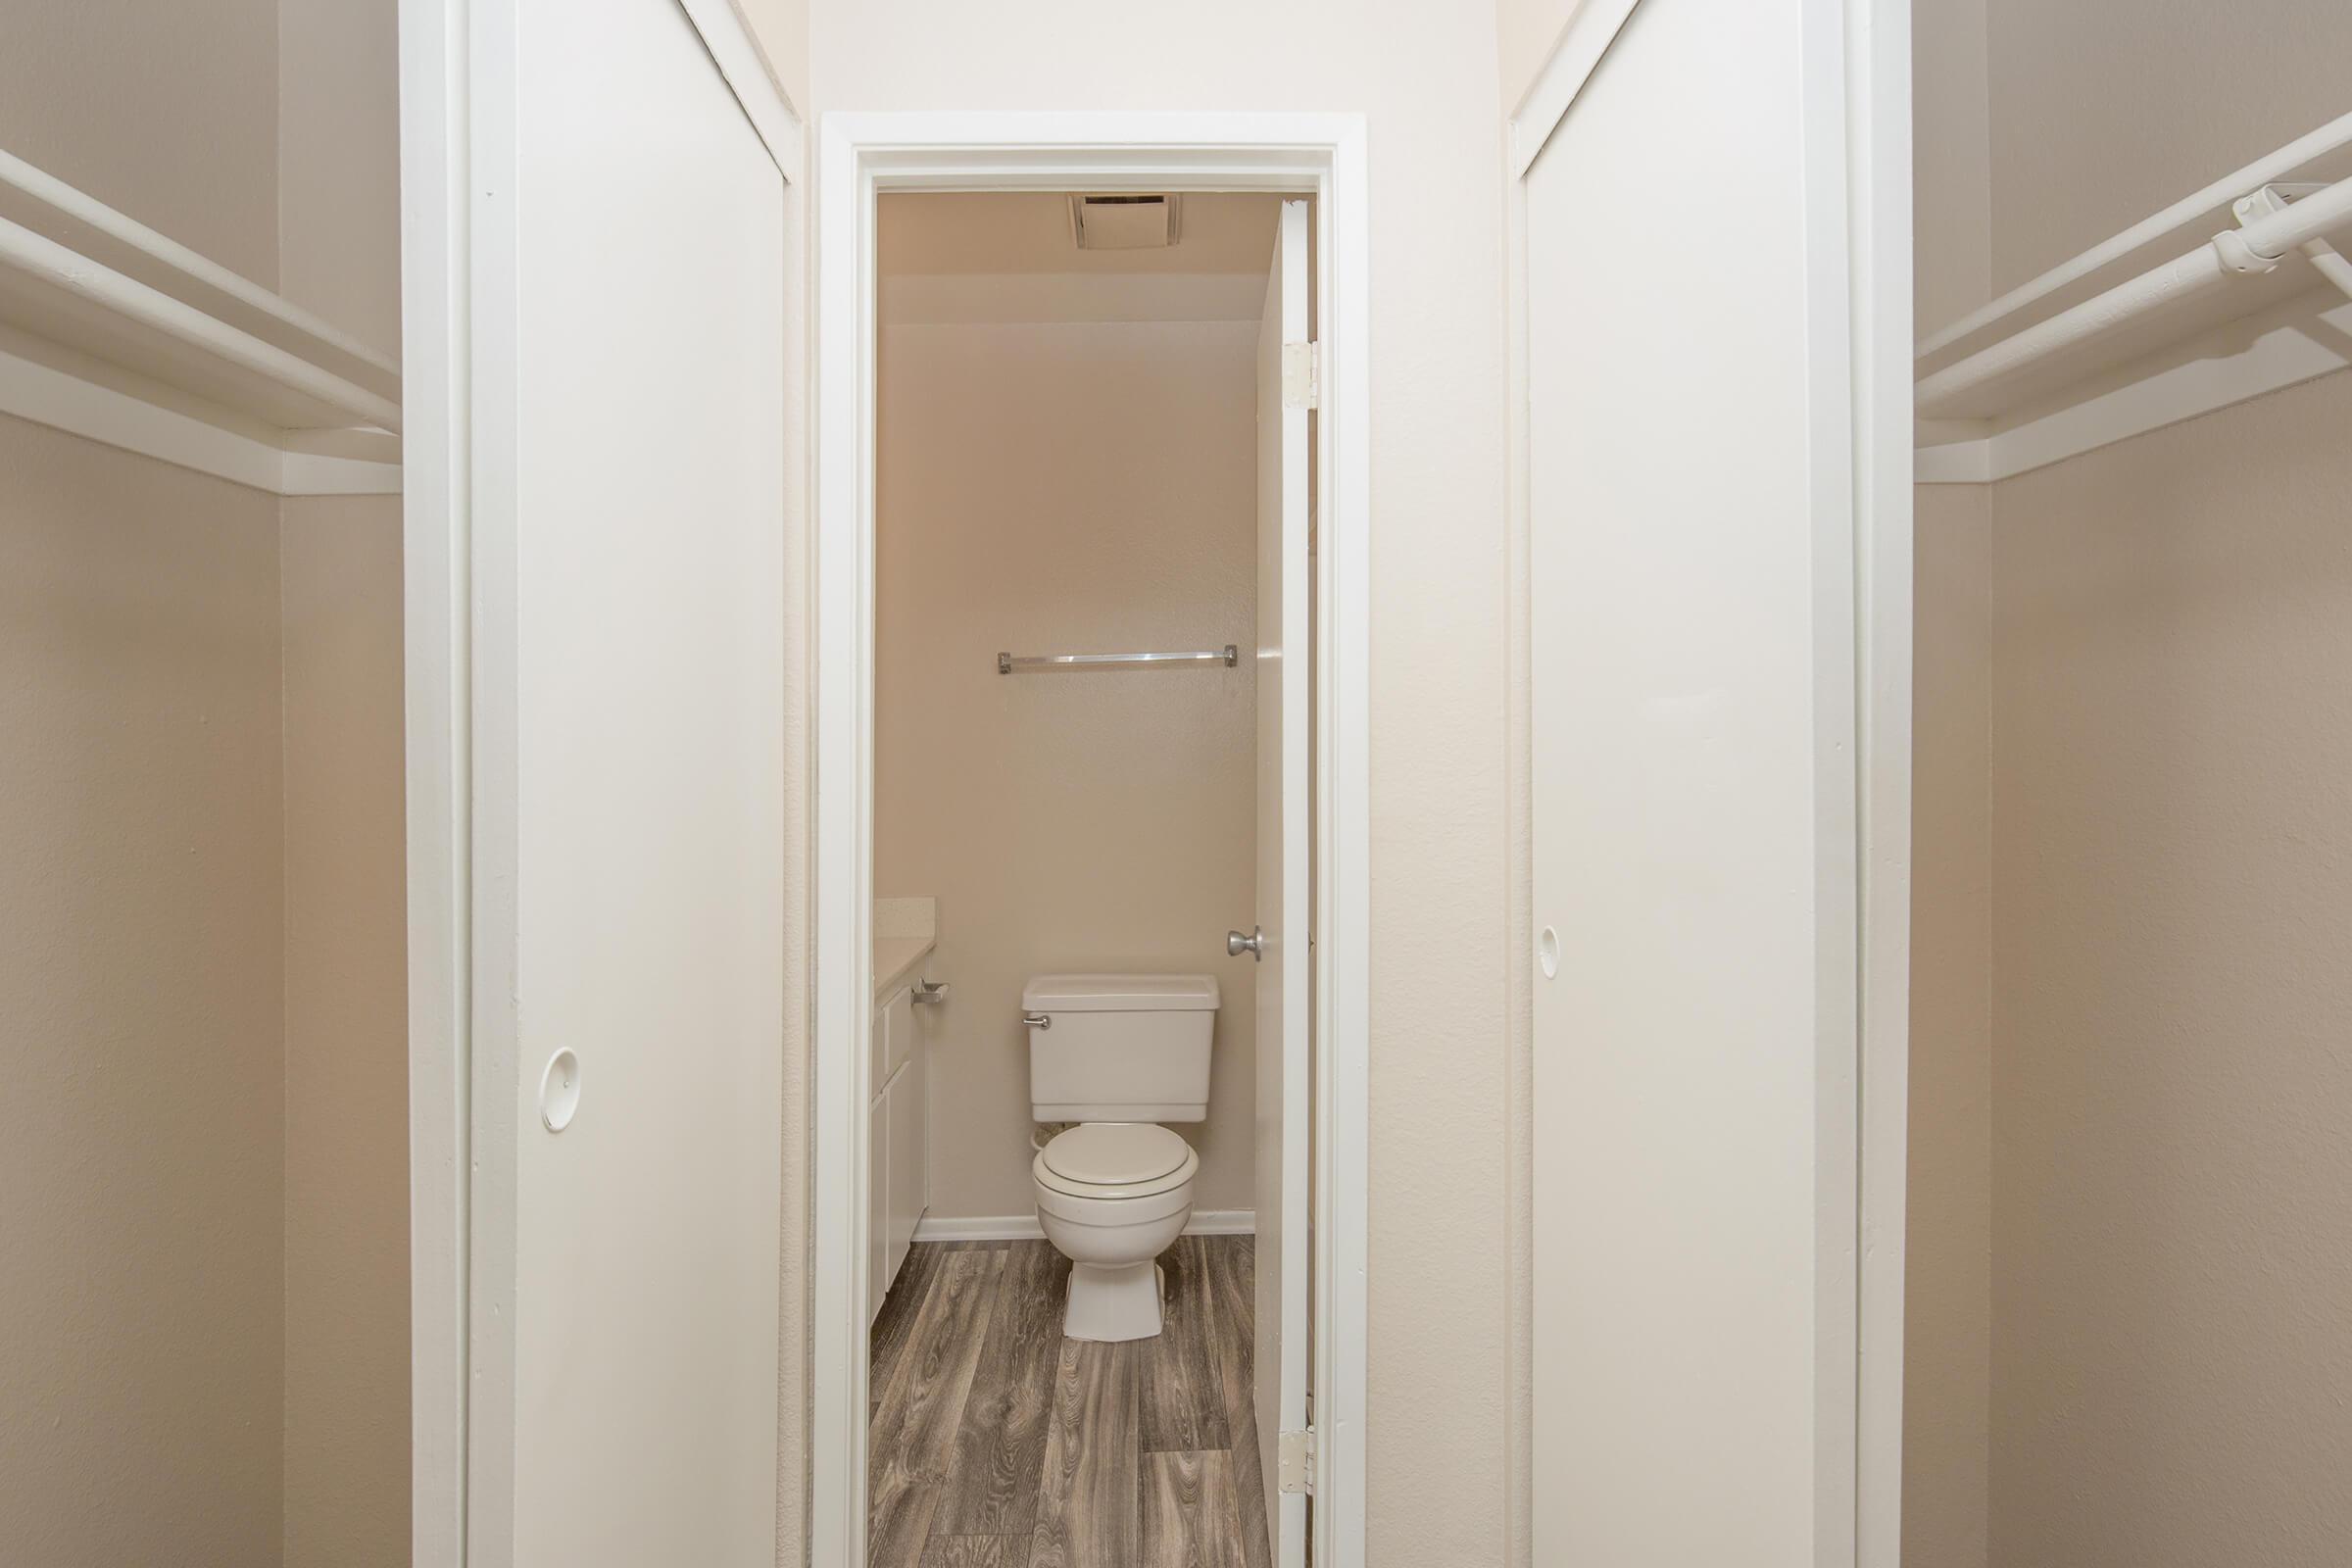 a white sink sitting next to a door